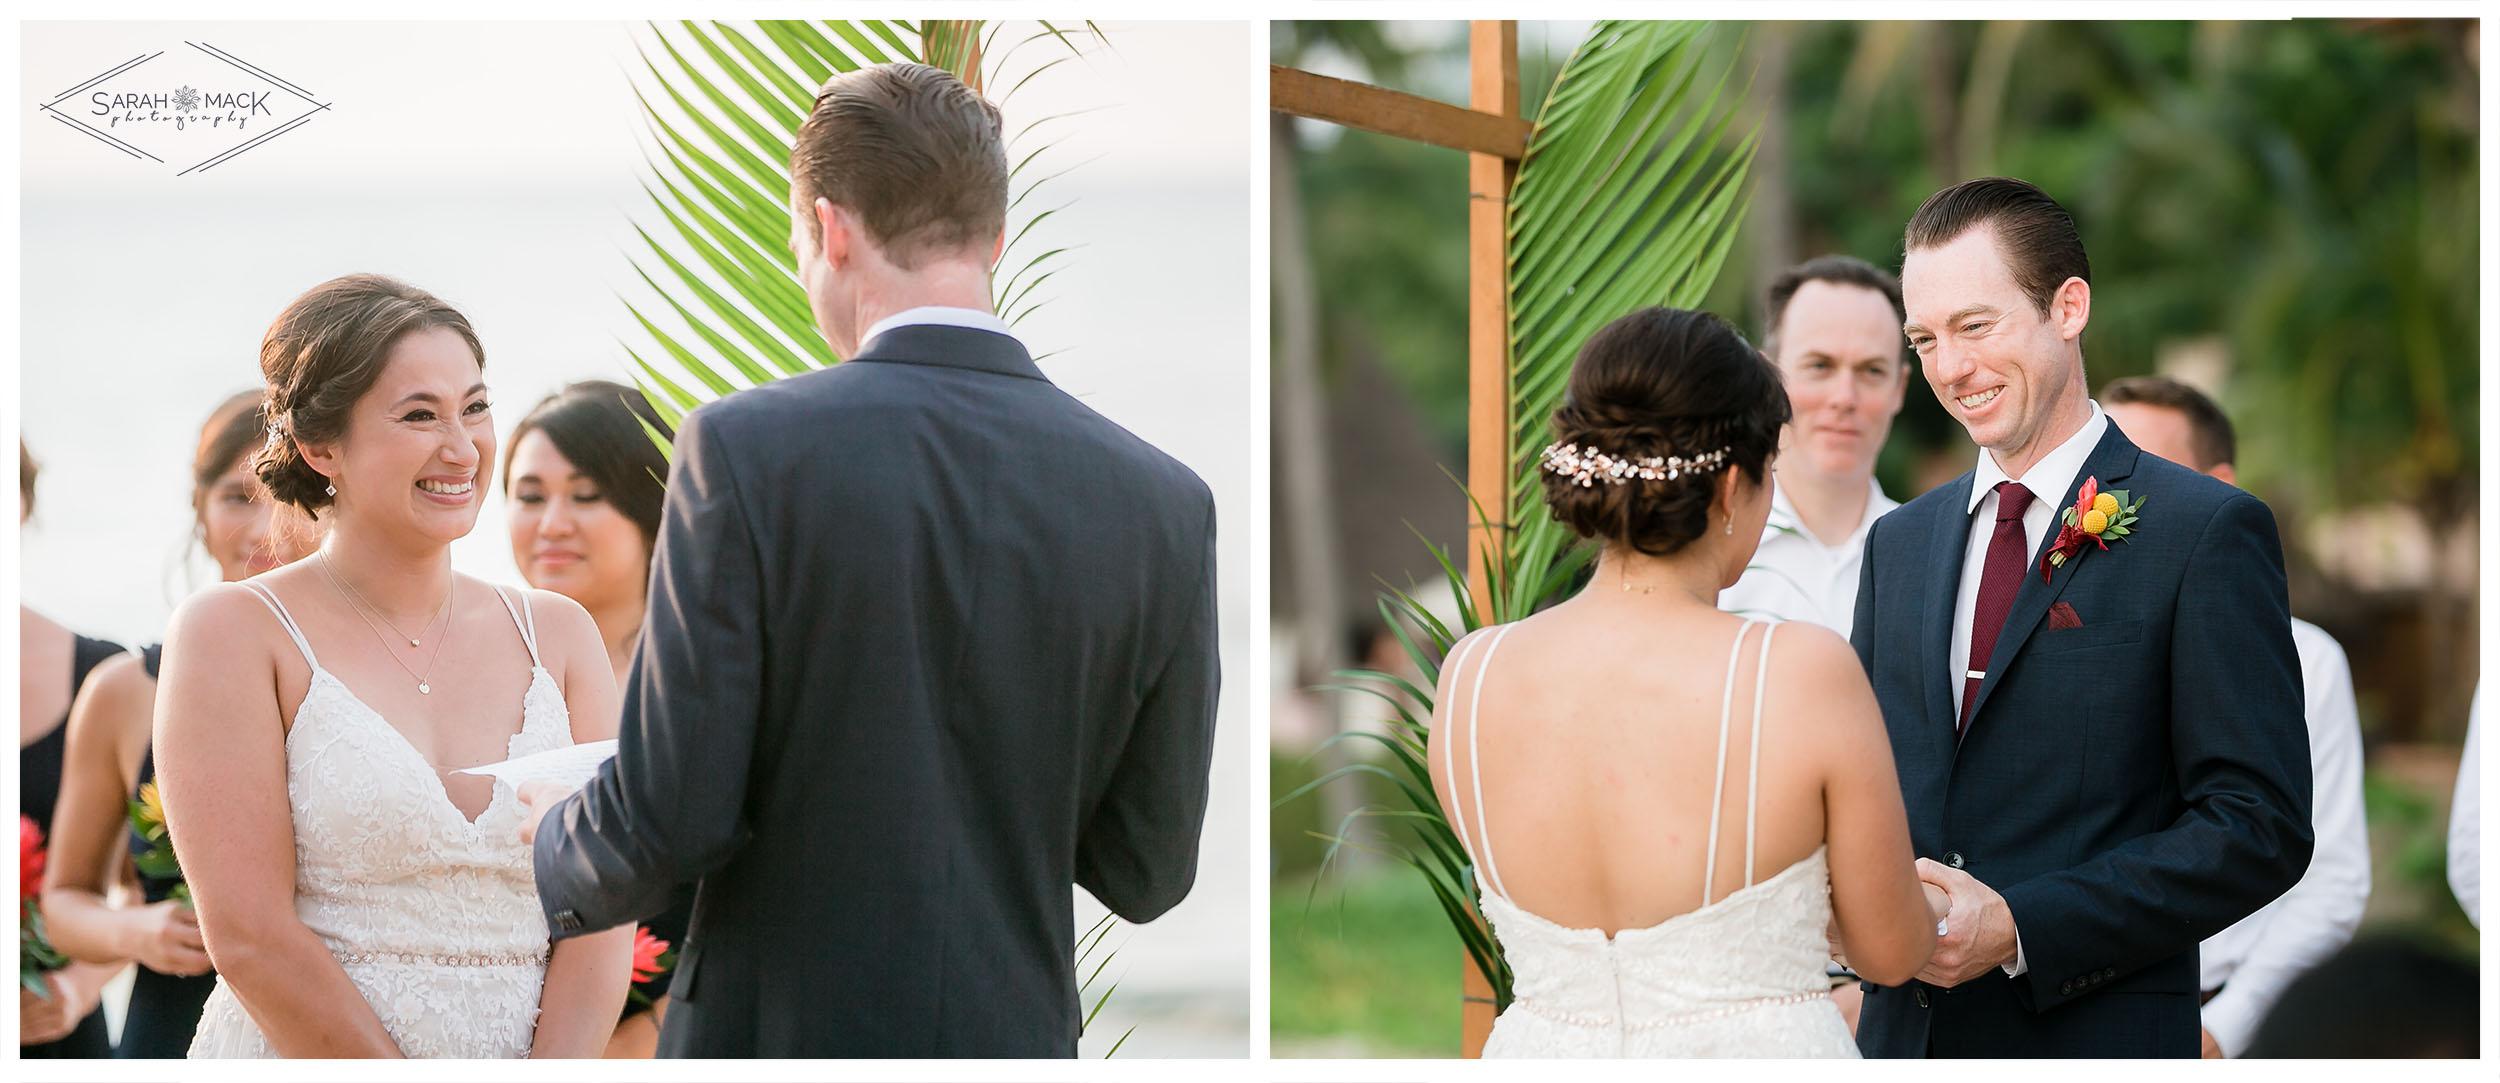 ES-Flor-de-Playa-Sayulita-Wedding-Photography-39.jpg